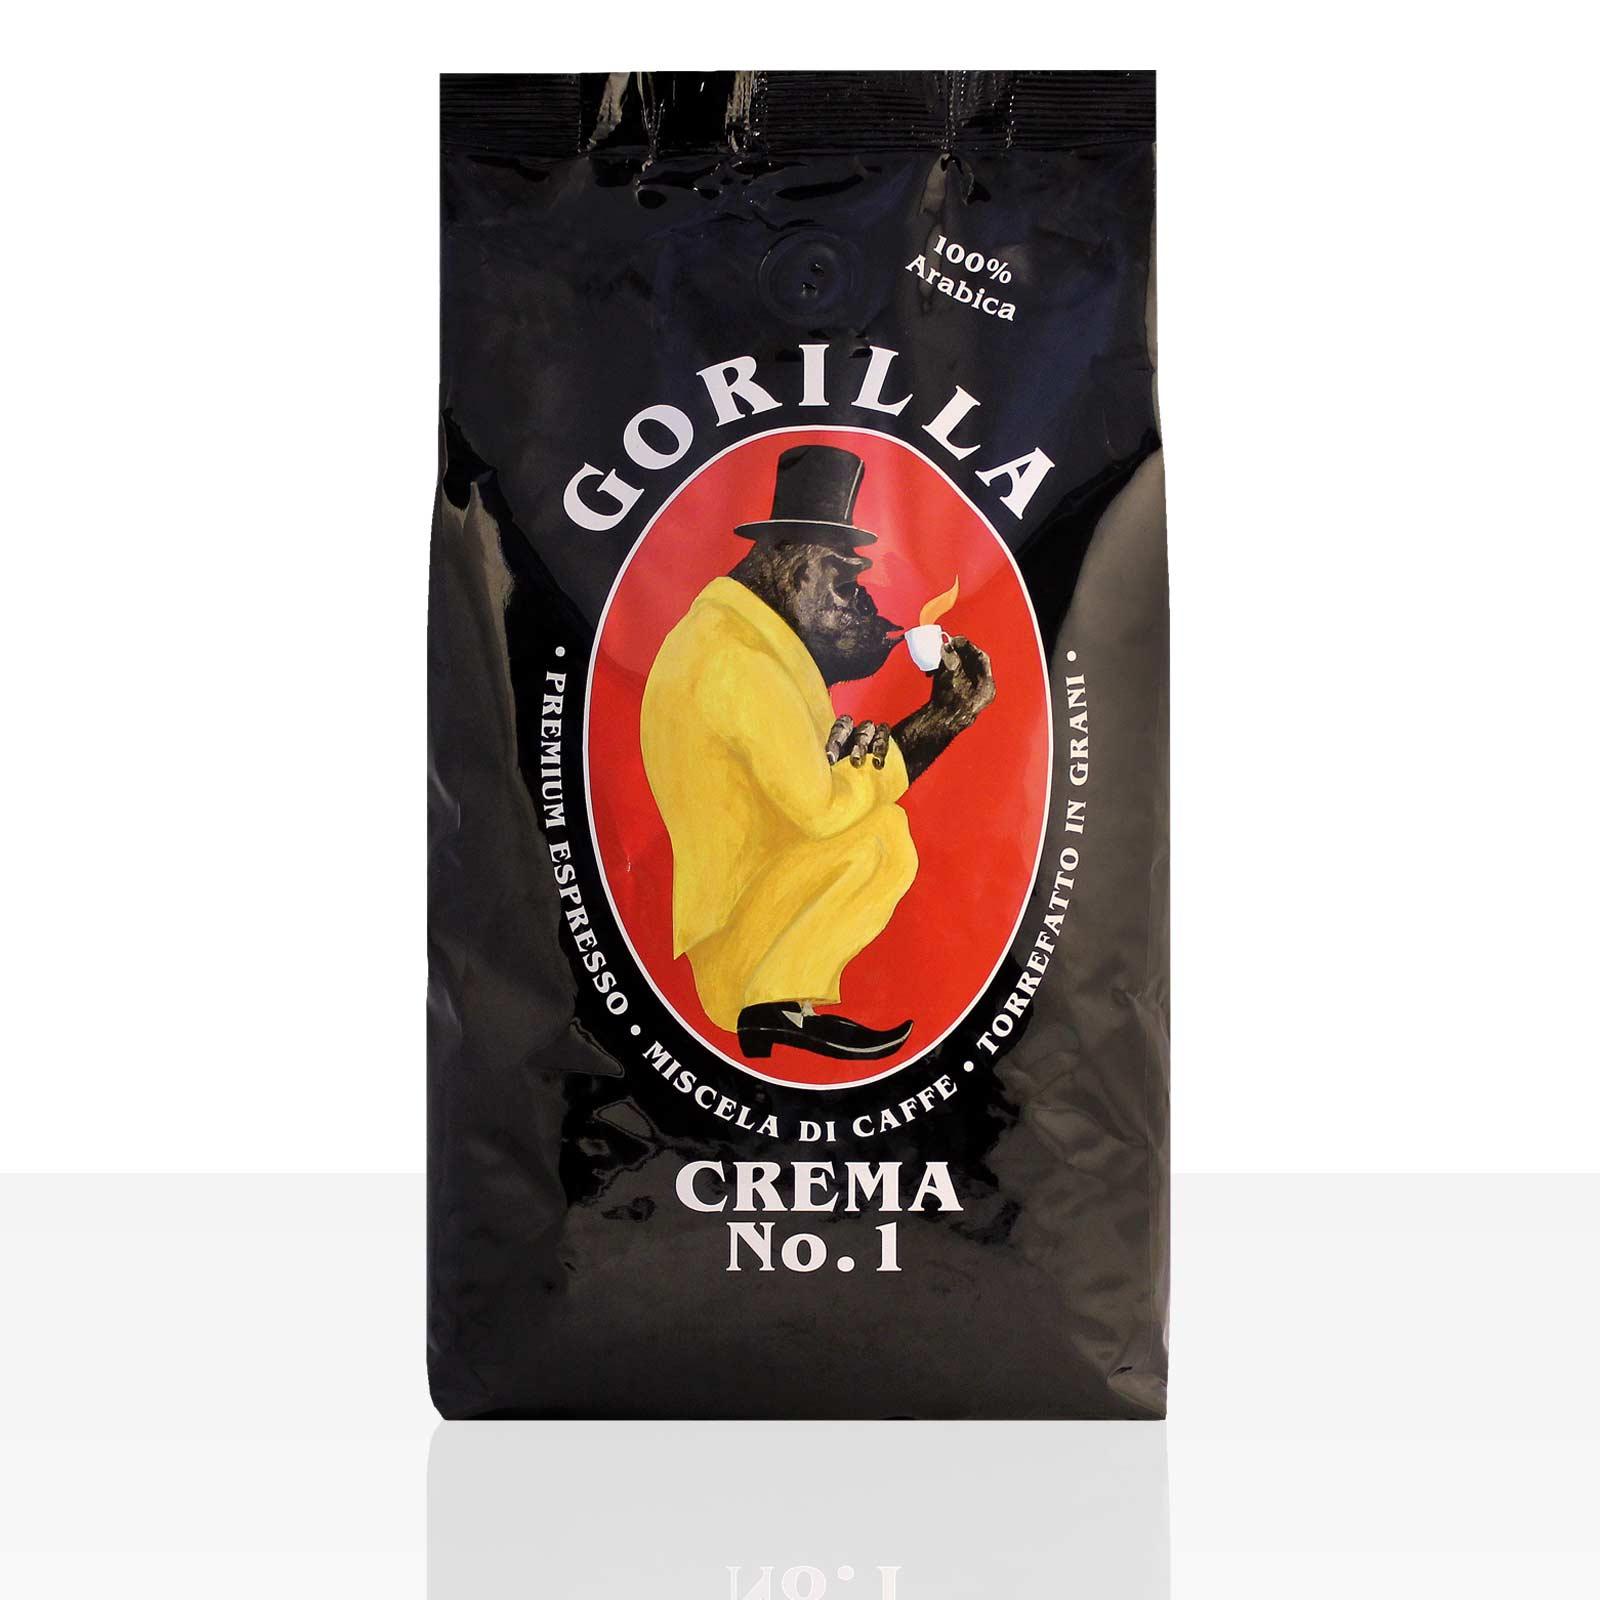 Gorilla Espresso Crema N° 1 Kaffee 1kg ganze Bohne, 100% Arabica